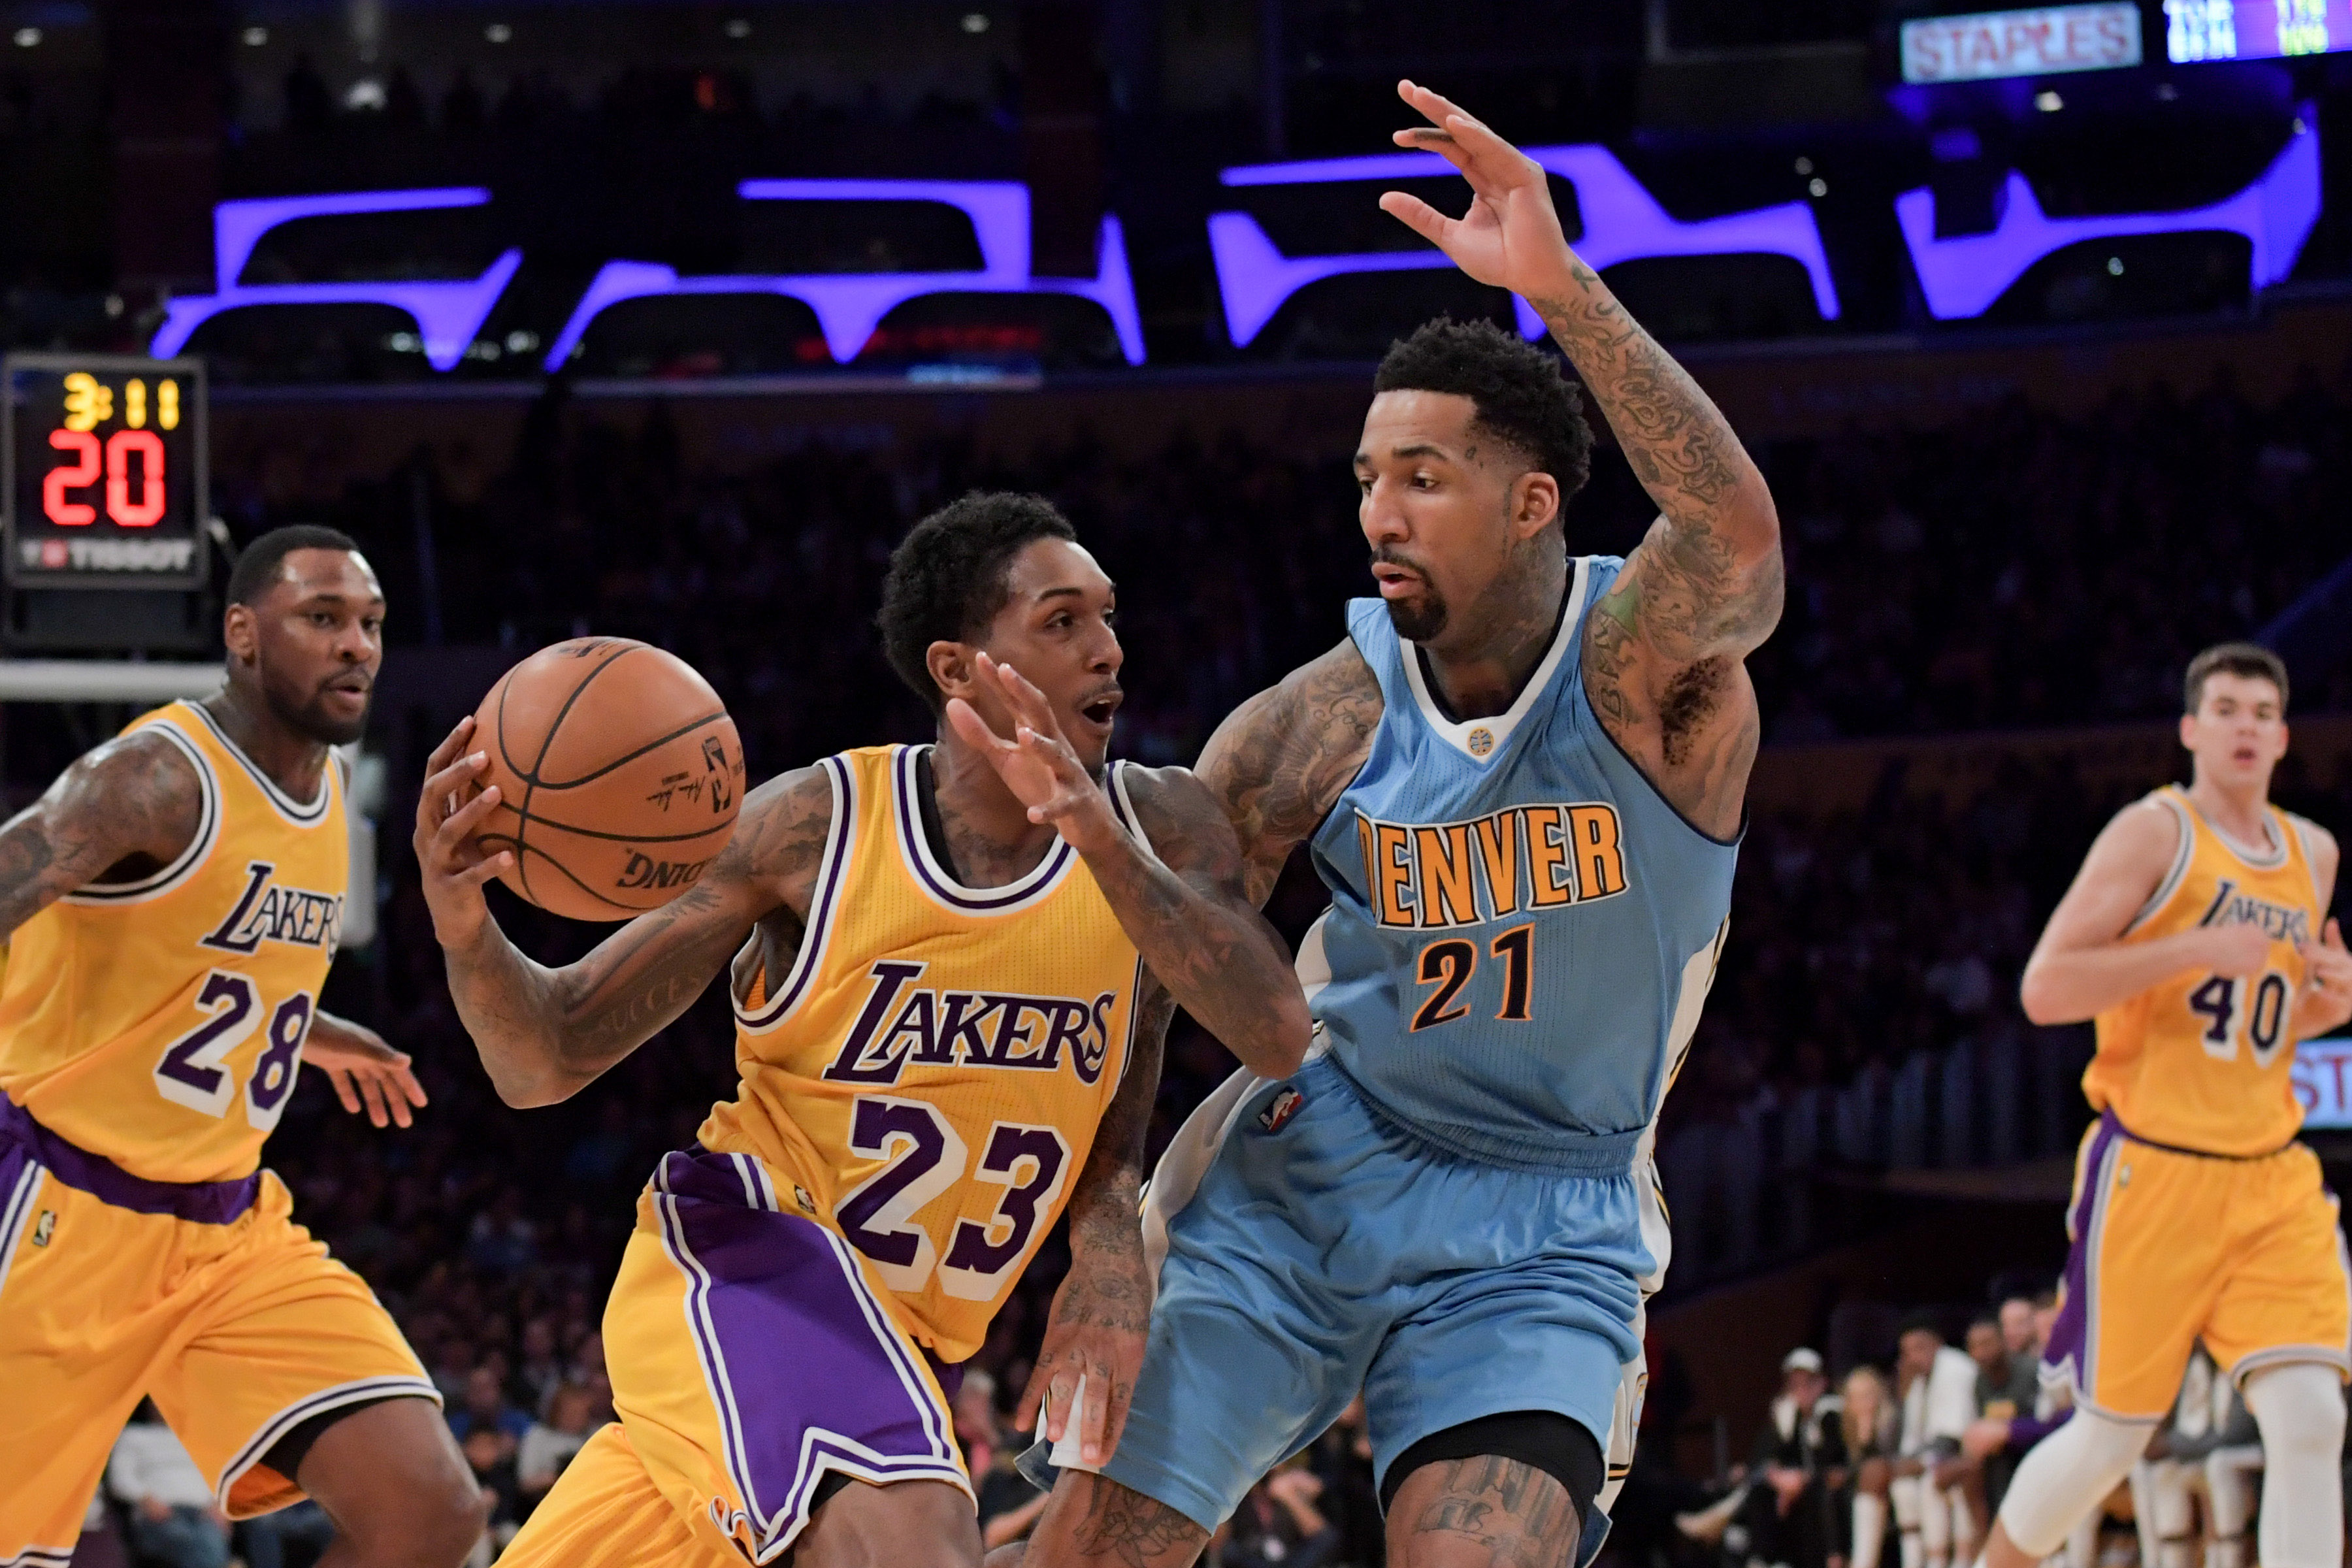 Nba Basketball Los Angeles Lakers: Orlando Magic: Wilson Chandler The Answer